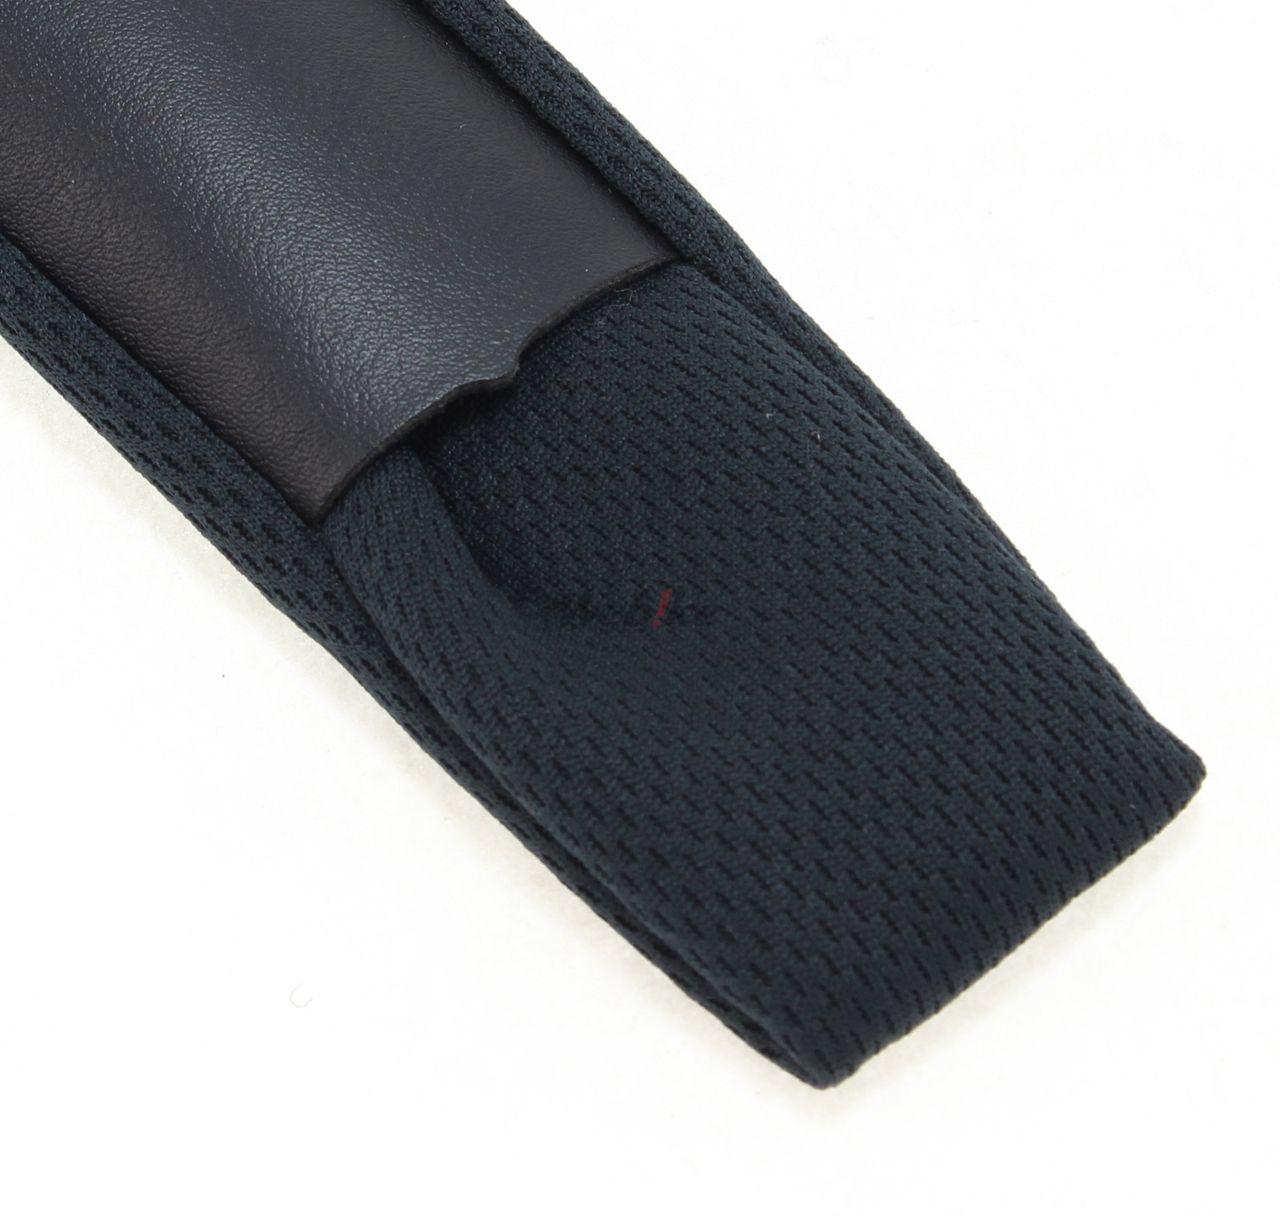 【OGK KABUTO】VALER 安全帽 下巴扣環護套組 - 「Webike-摩托百貨」